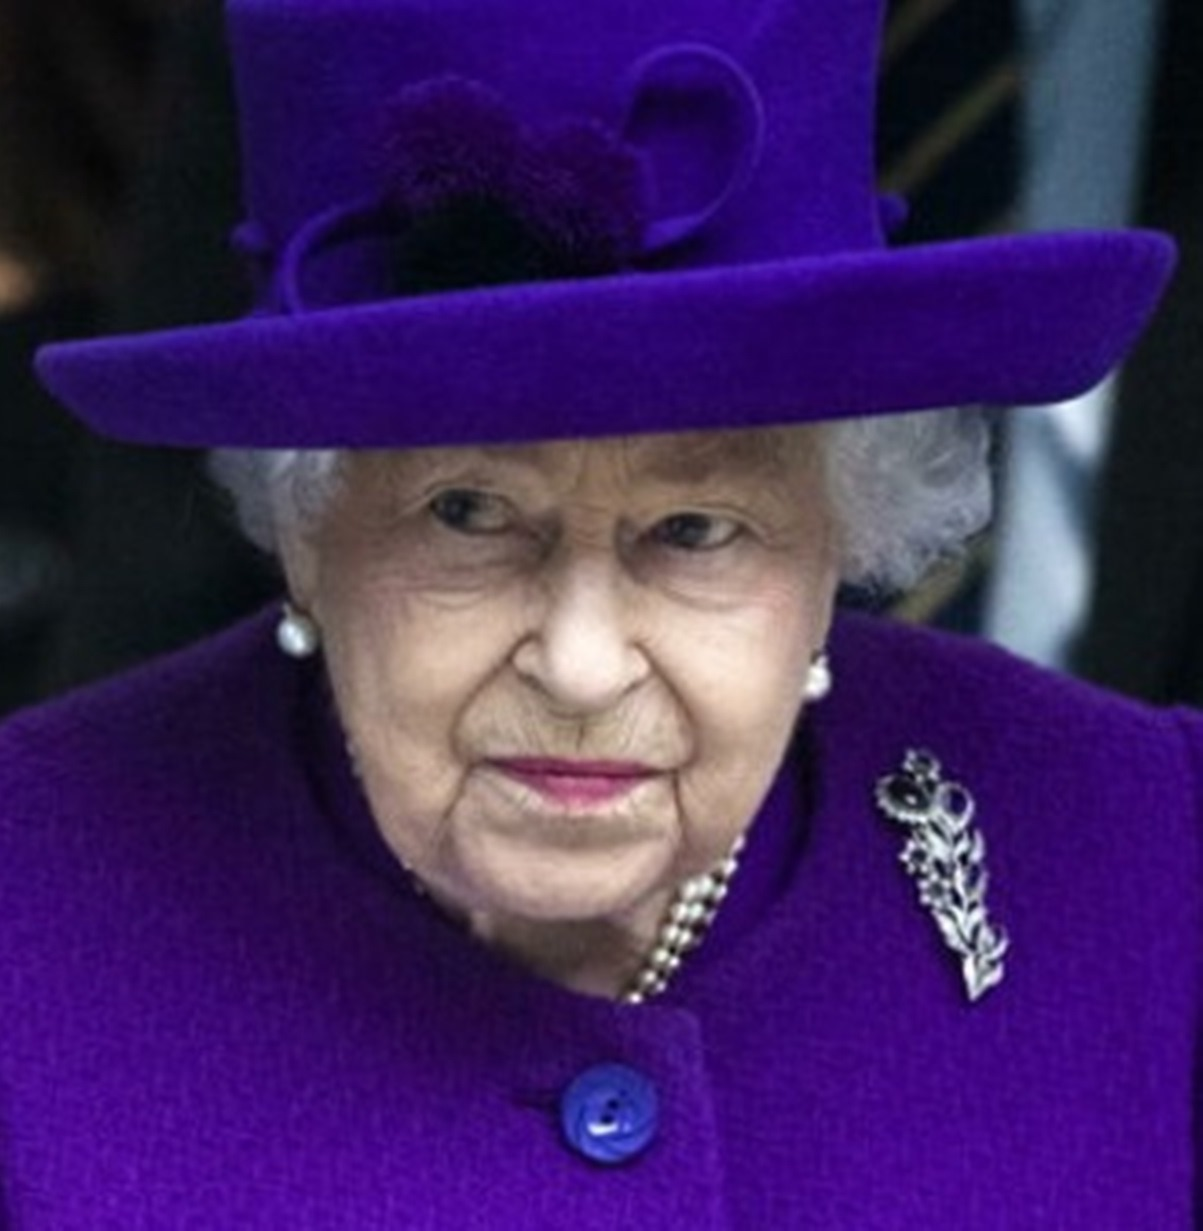 harry meghan figlia regina elisabetta